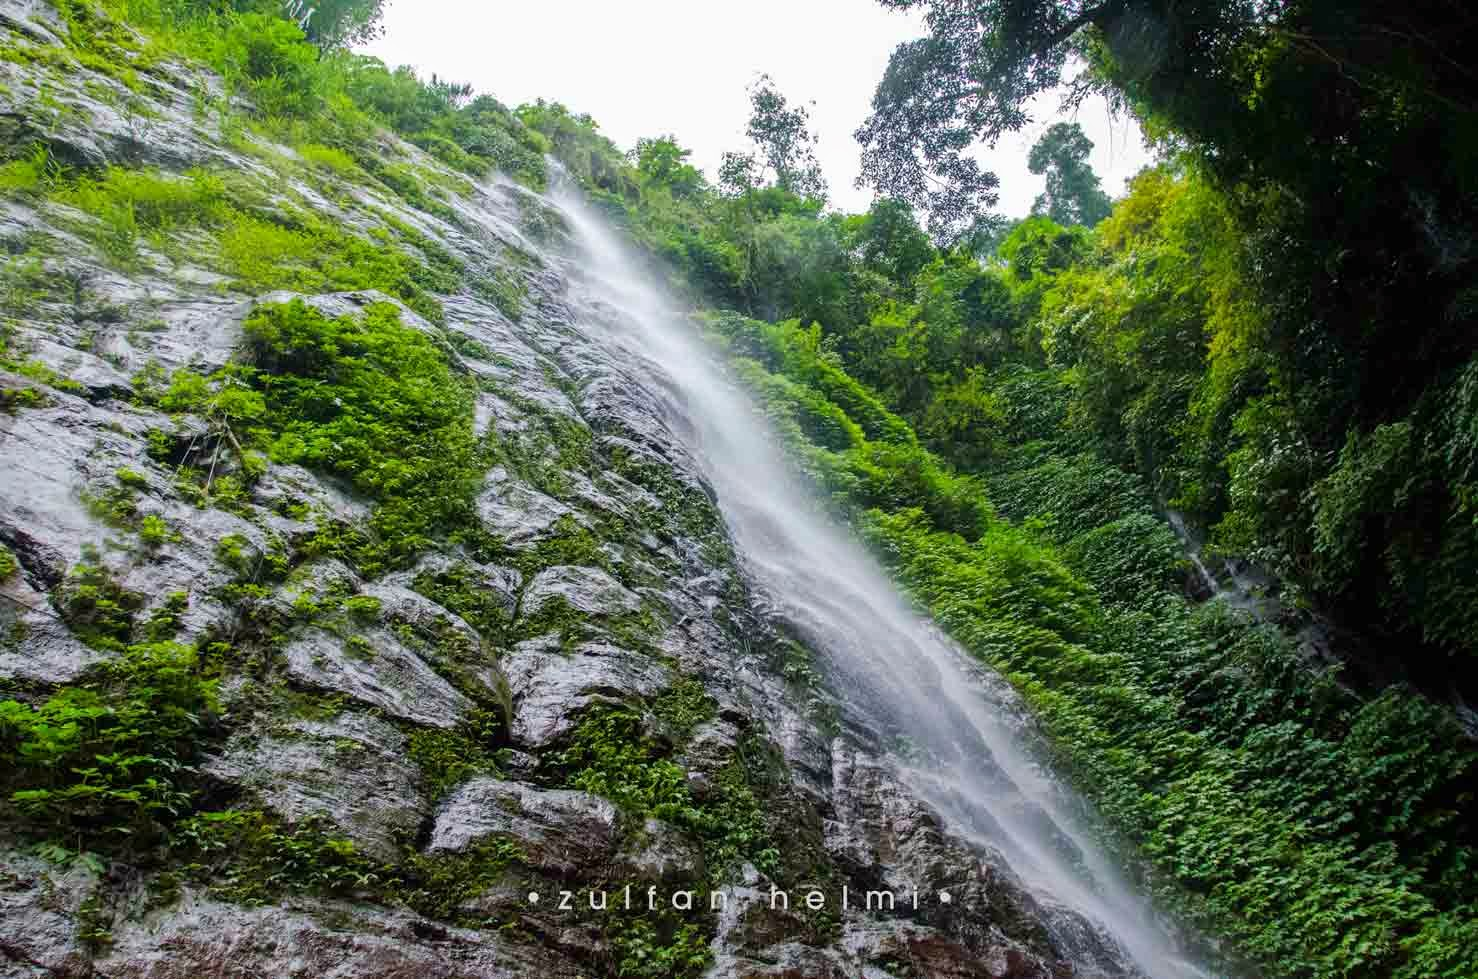 Air Terjun Gunung Palang, Keindahan Dibalik Hutan Belantara